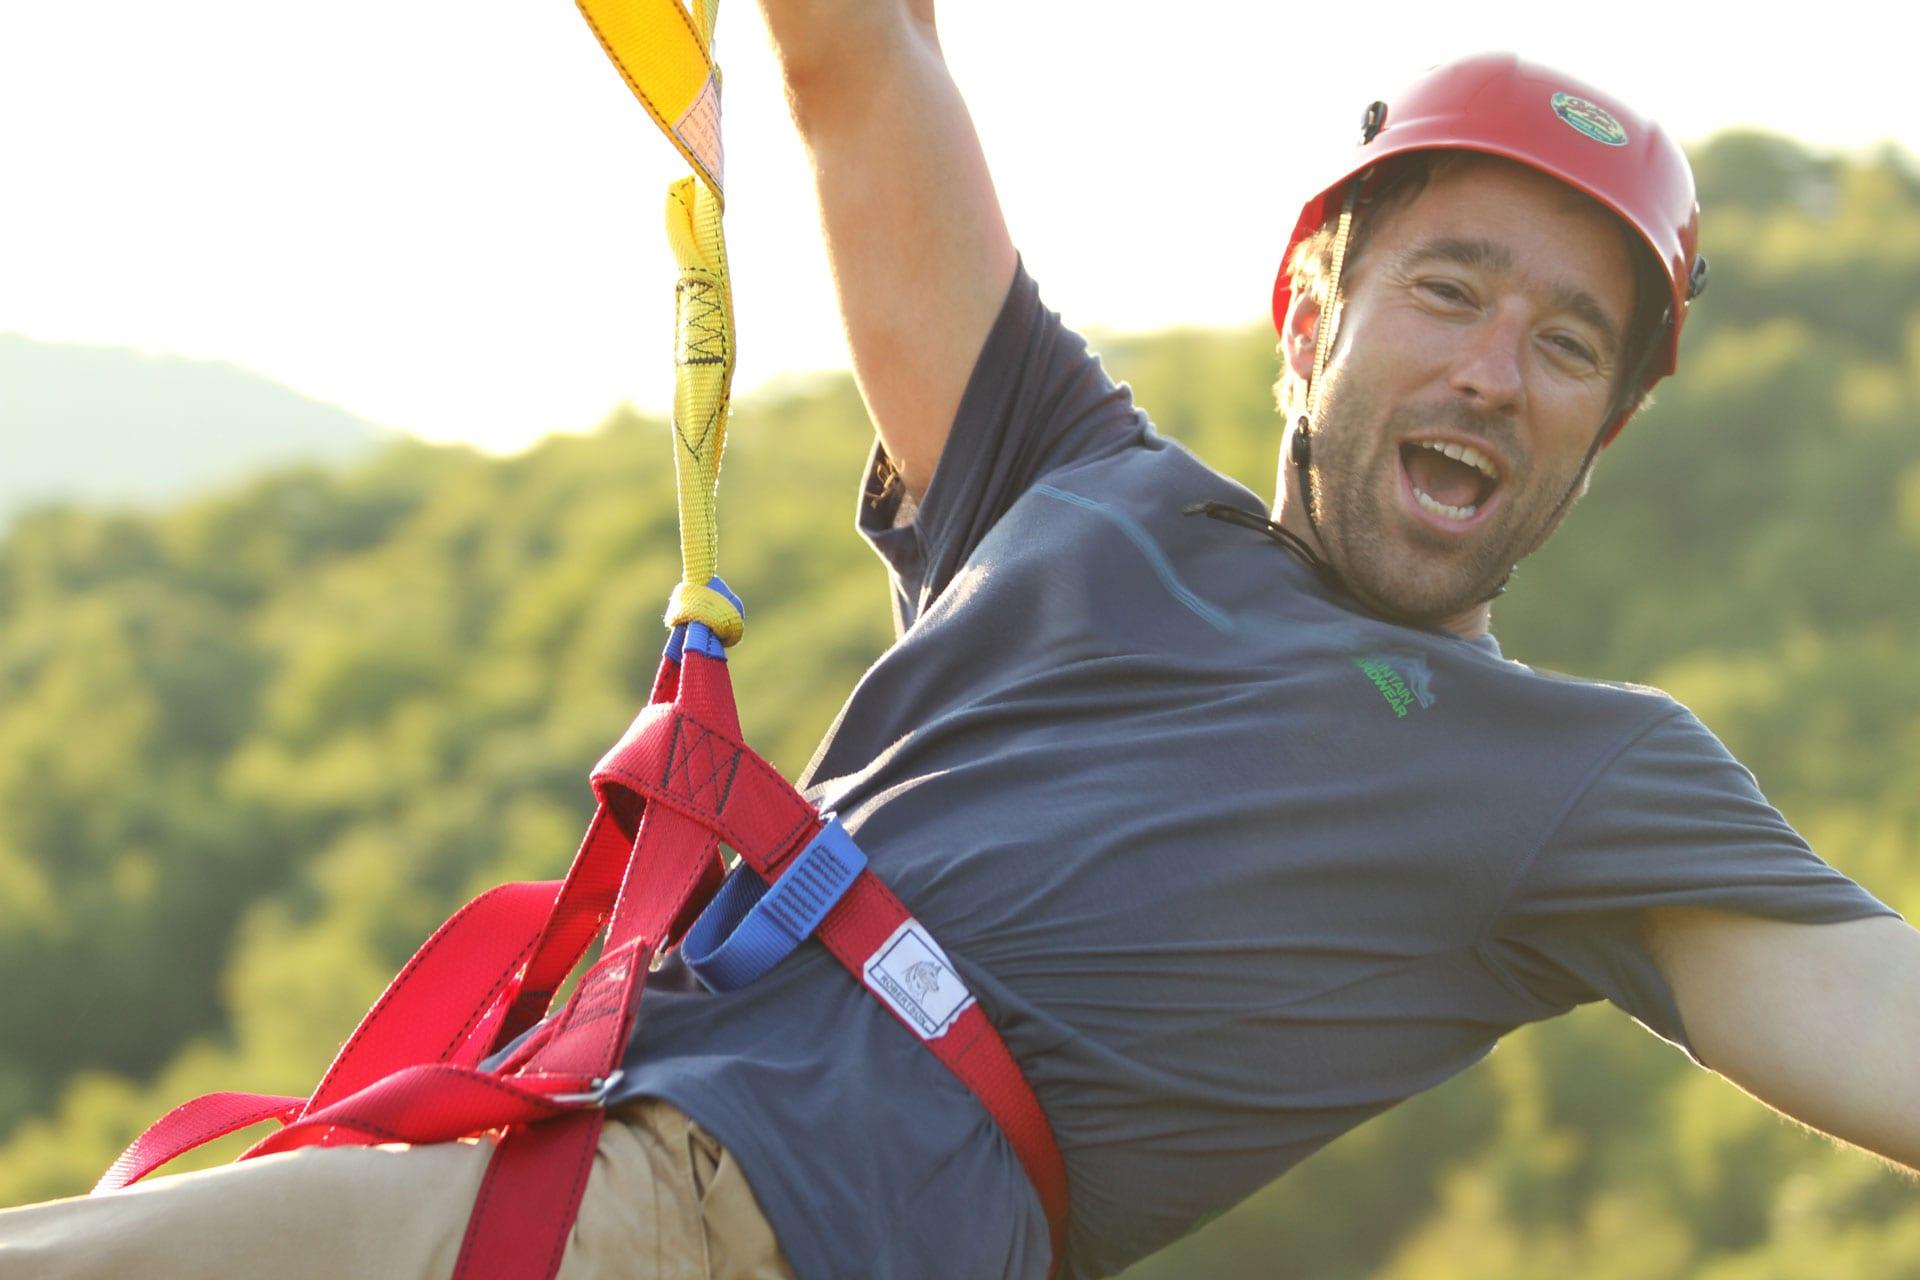 berk-east-ziplining-explorewesternmass.com